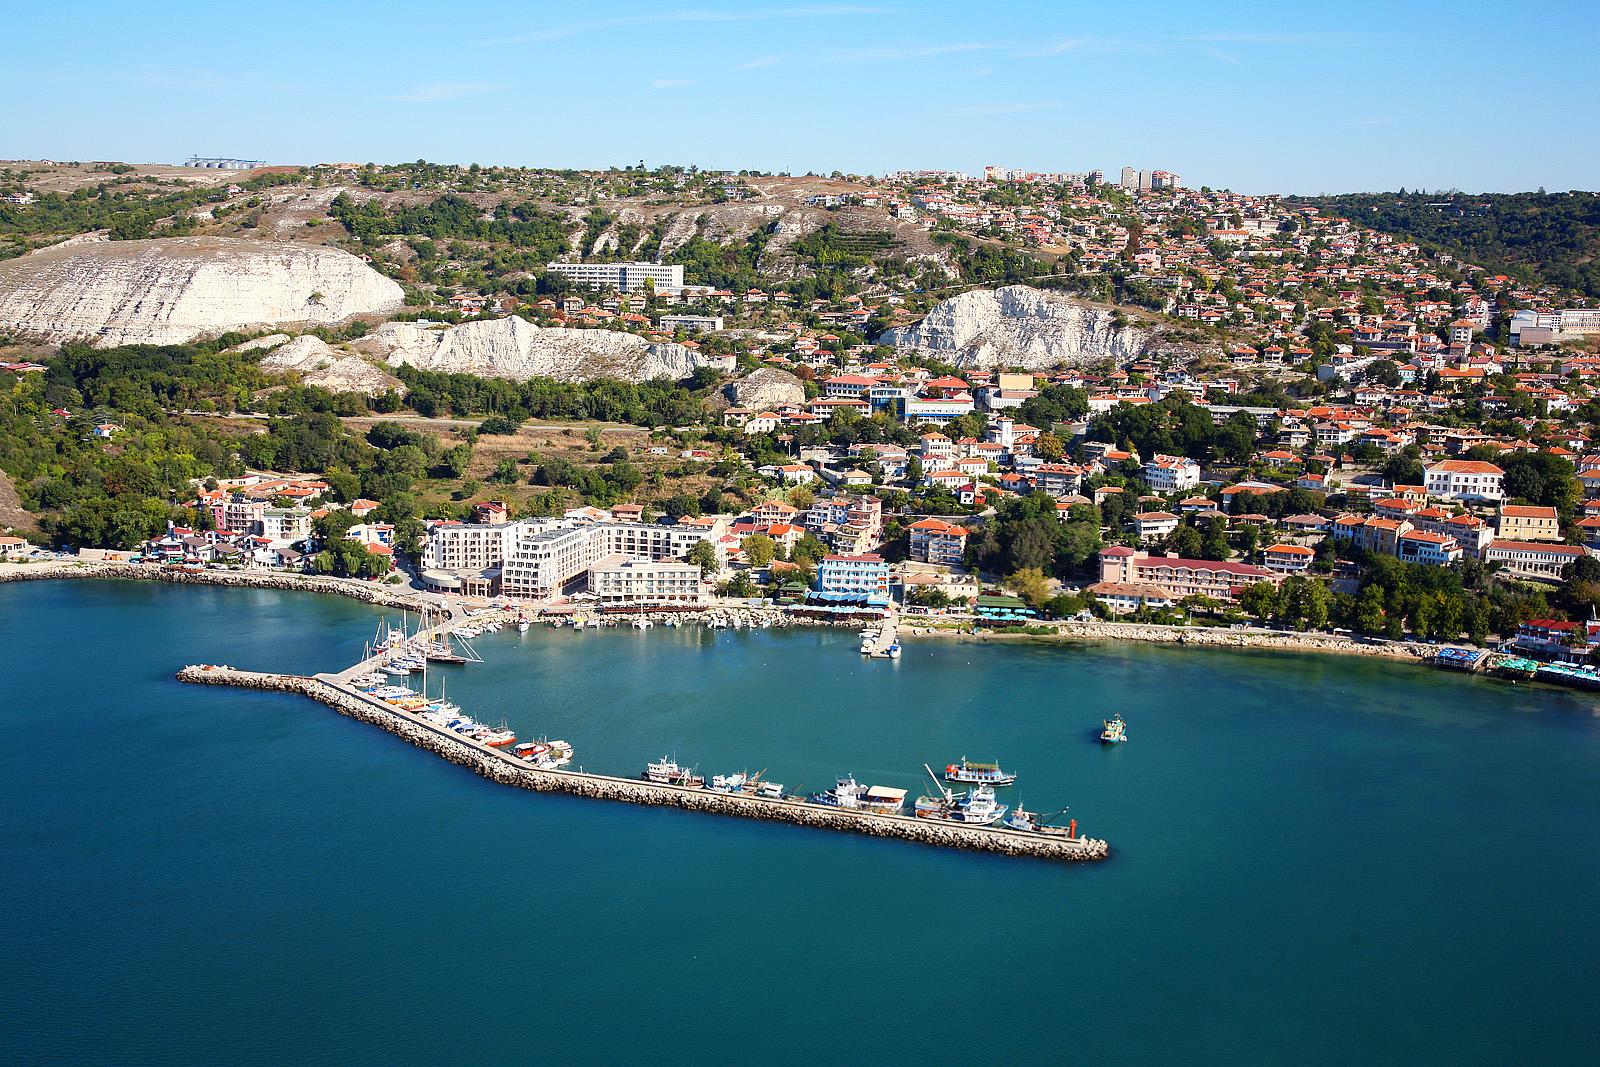 Balchik Bulgaria aerial photo from the Black Sea.jpg